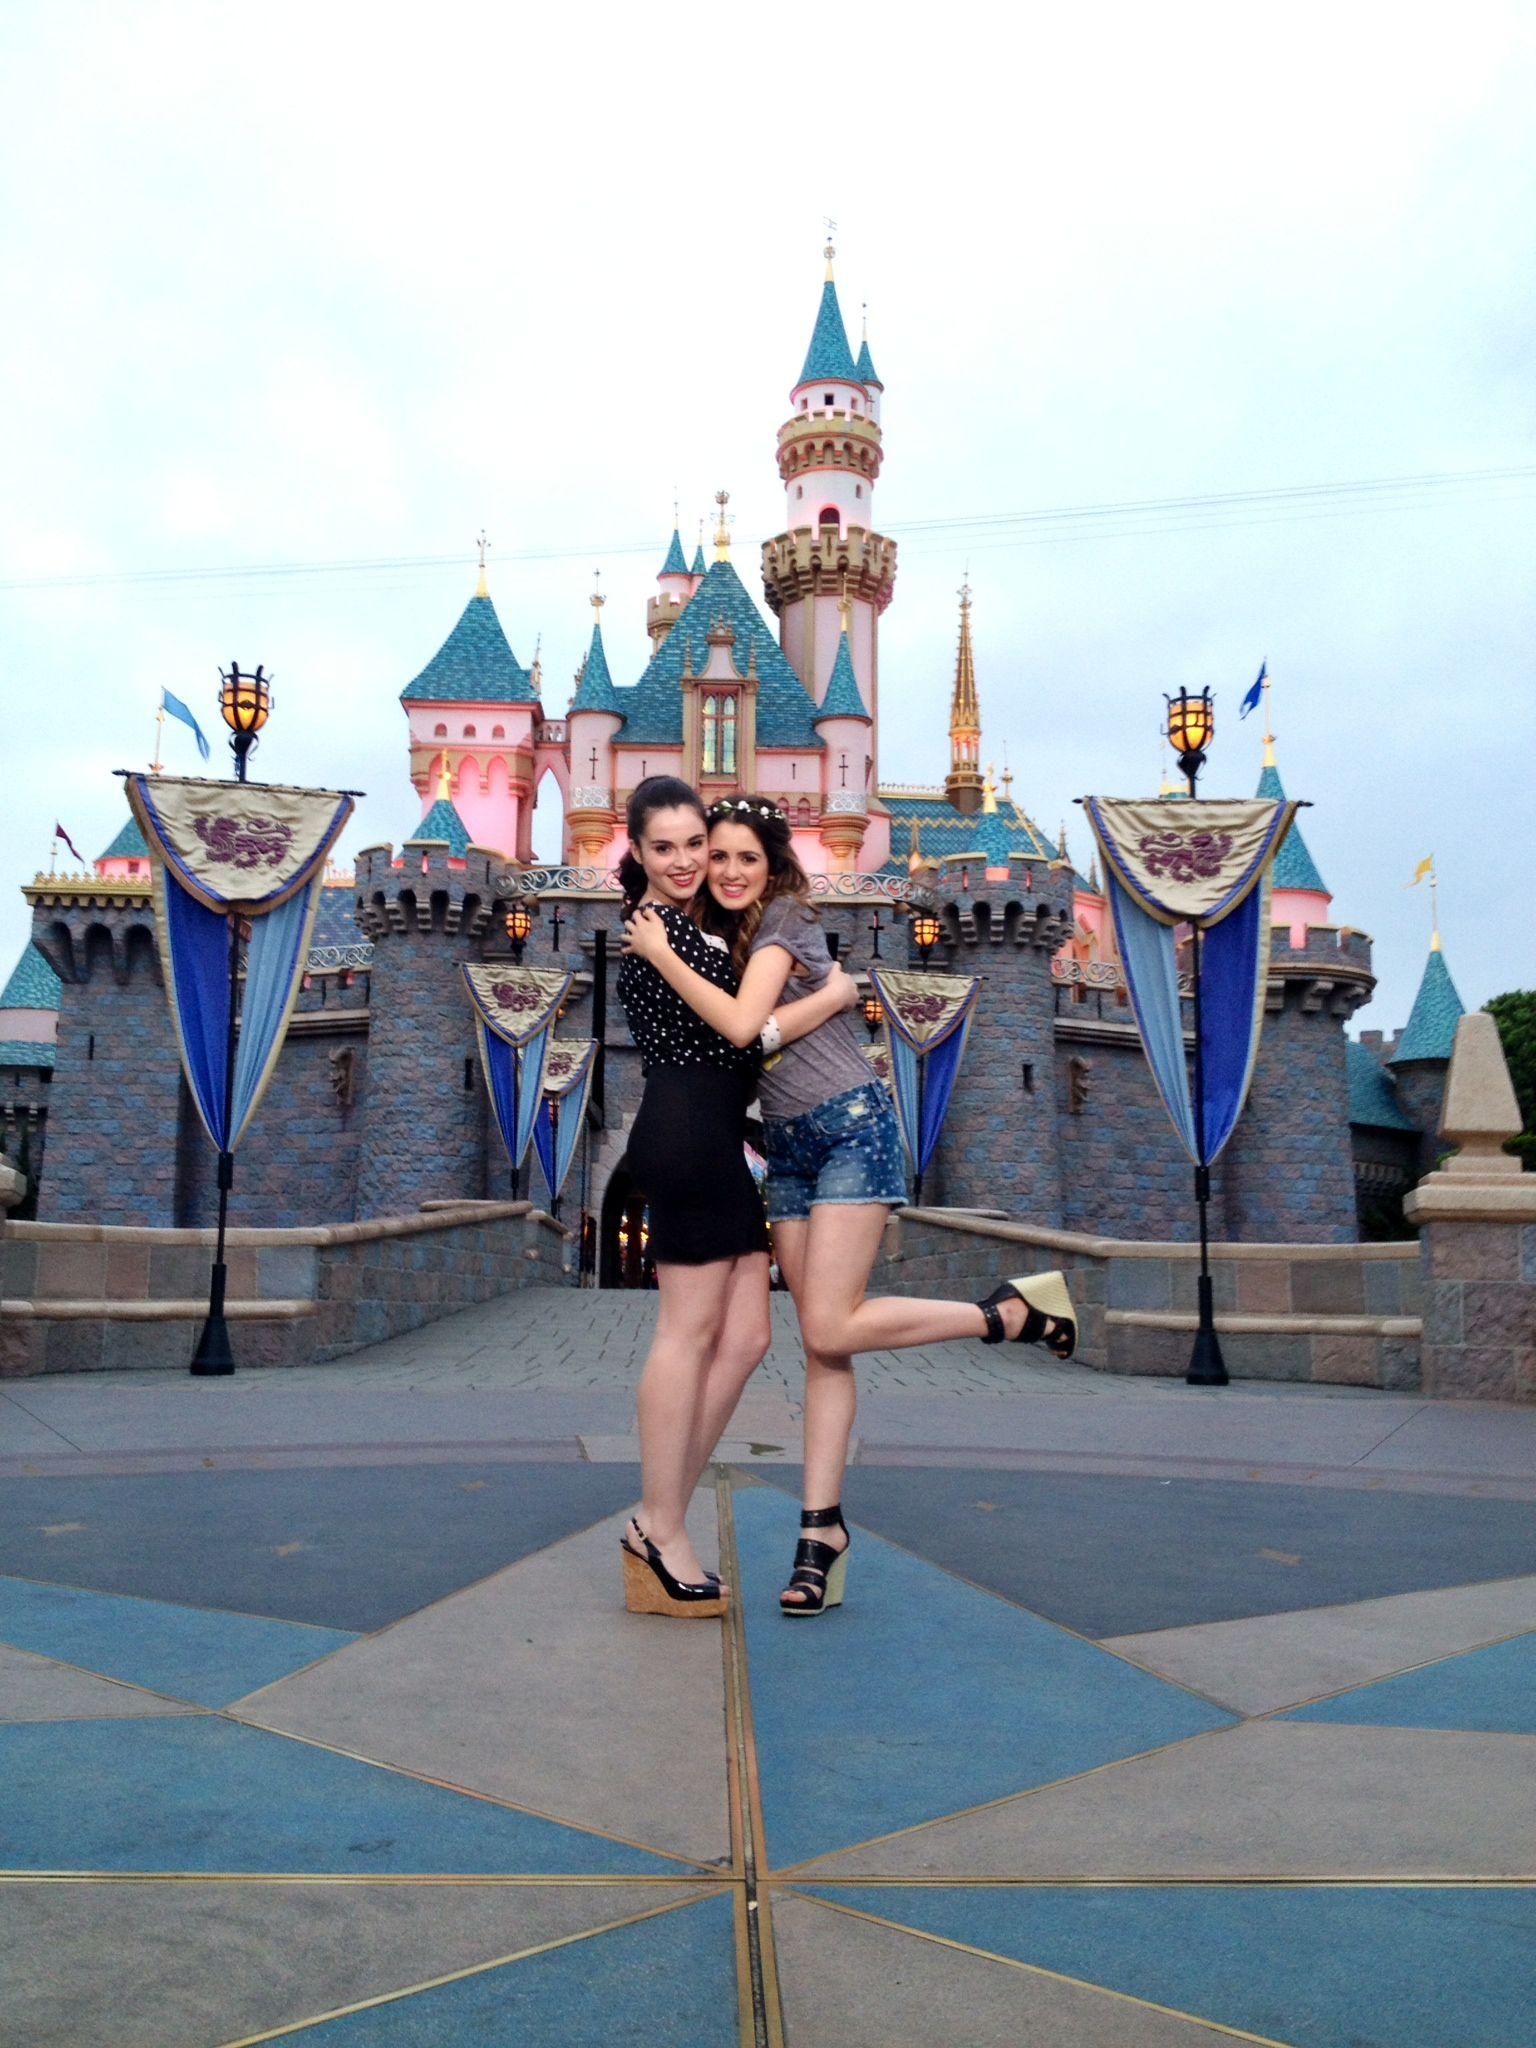 Vanessa Marano and her sister rocked their #DisneySide at #Disneyland this weekend!